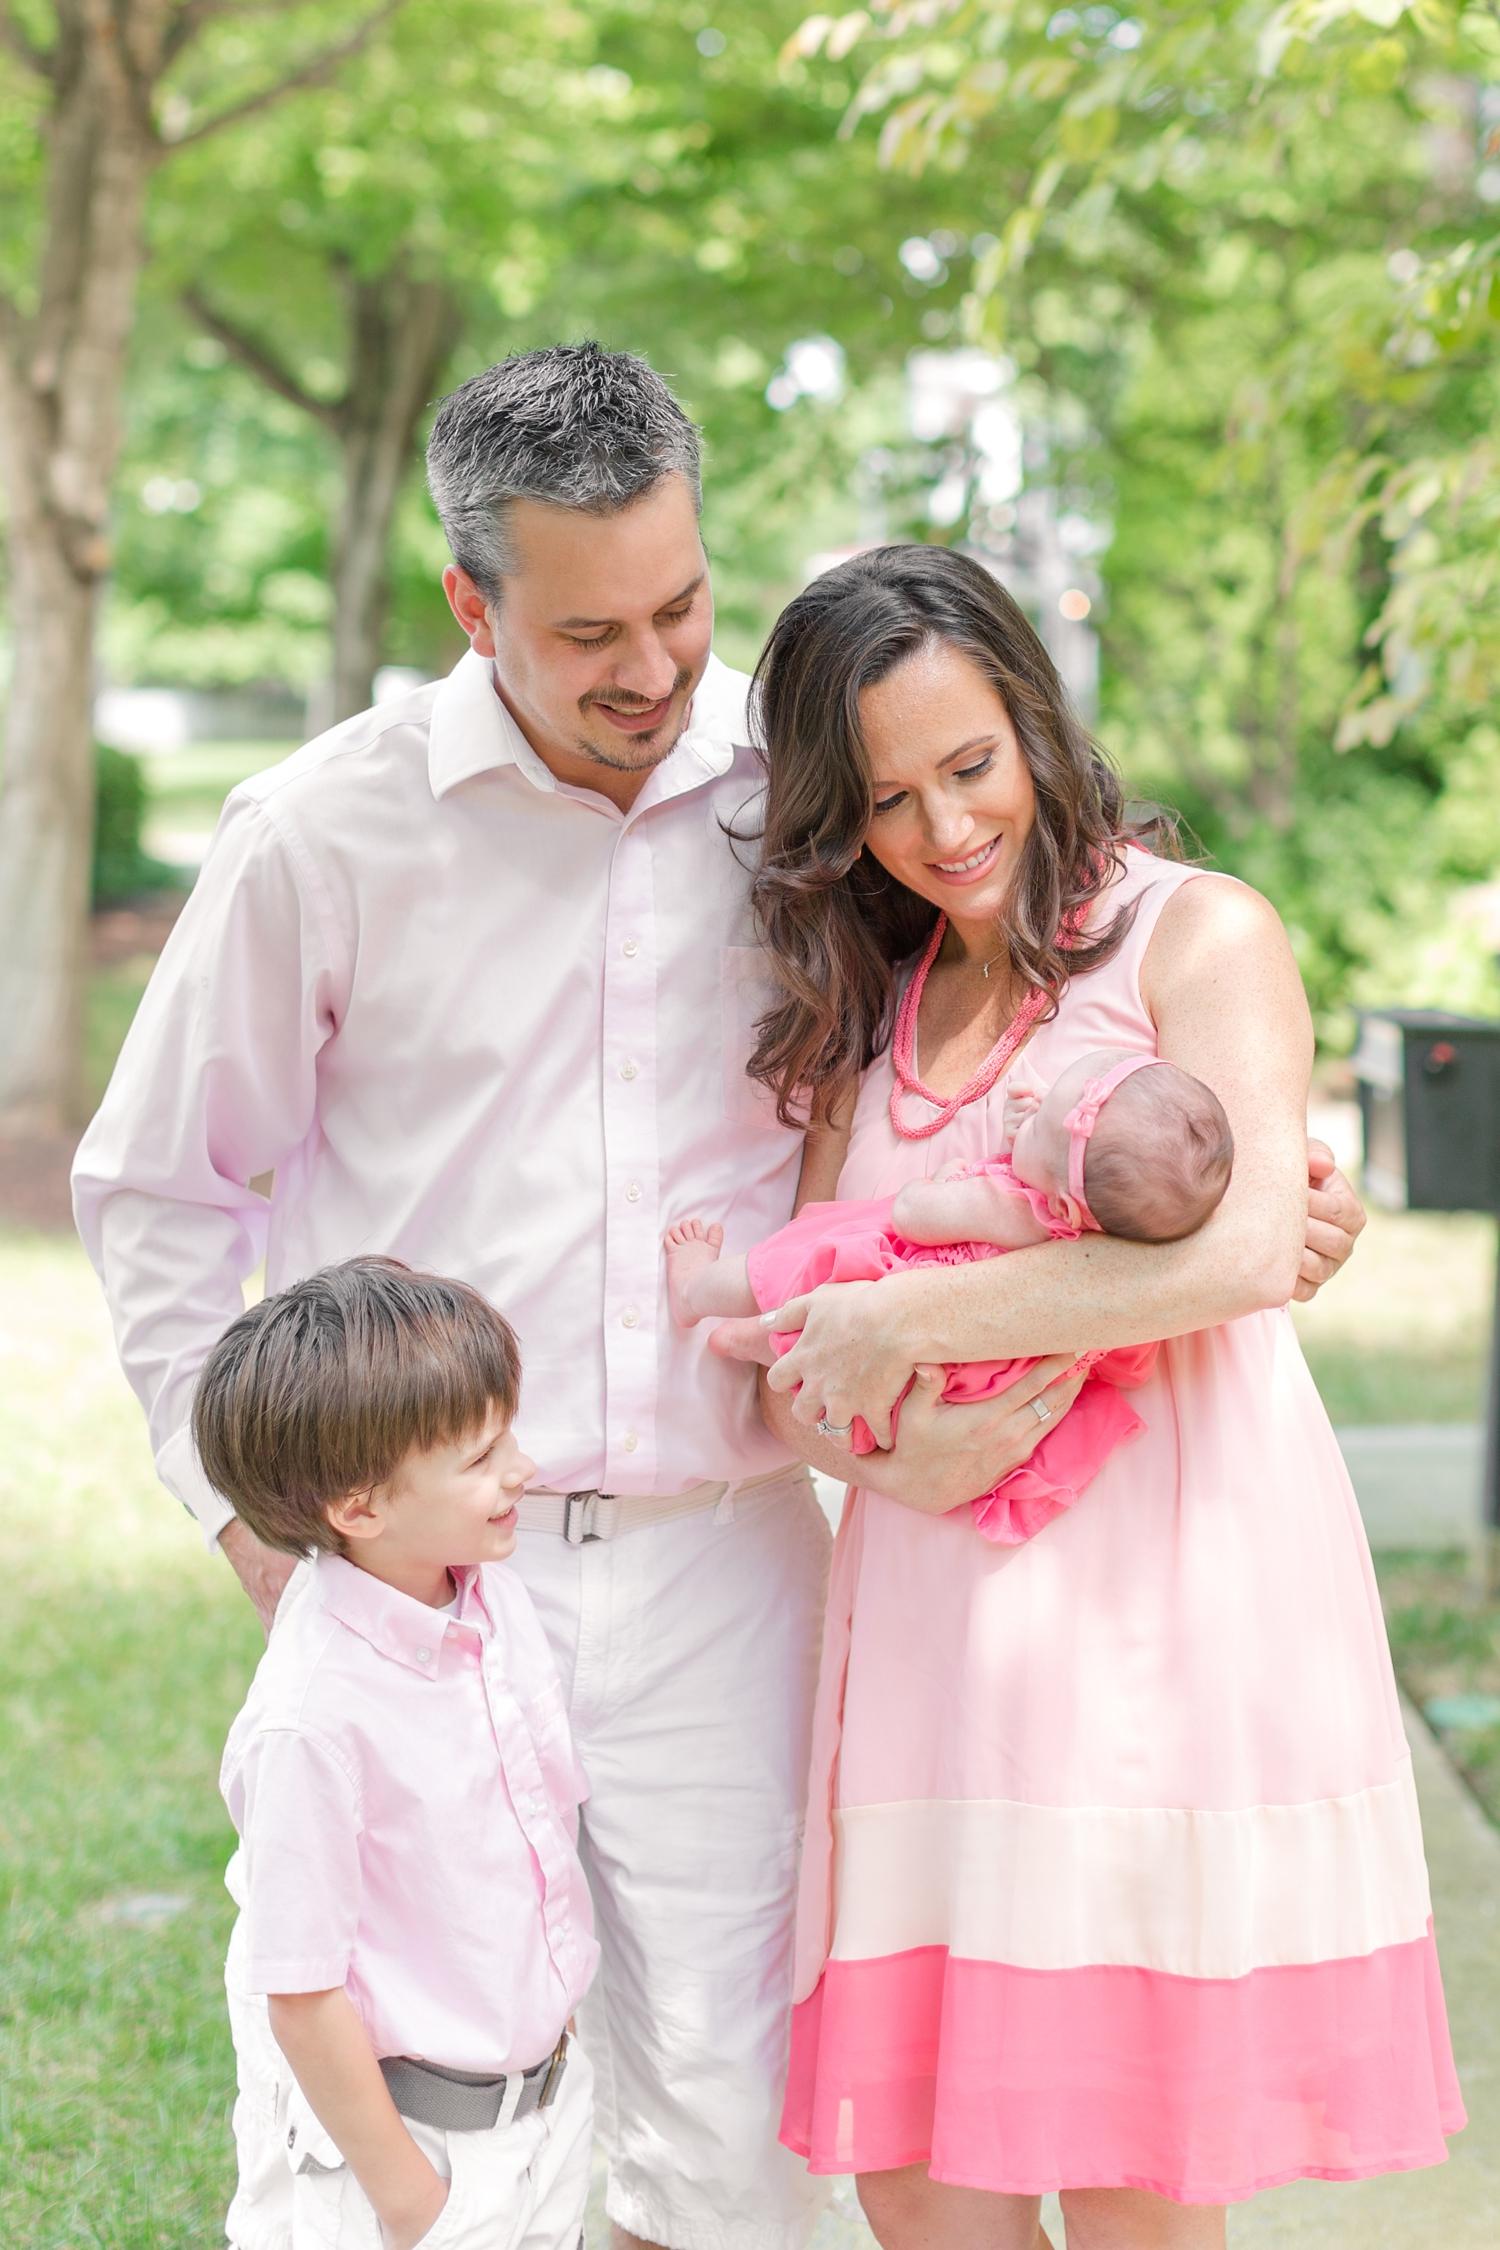 Manvilla Newborn-9_baltimore-maryland-newborn-family-photographer-anna-grace-photography-photo.jpg